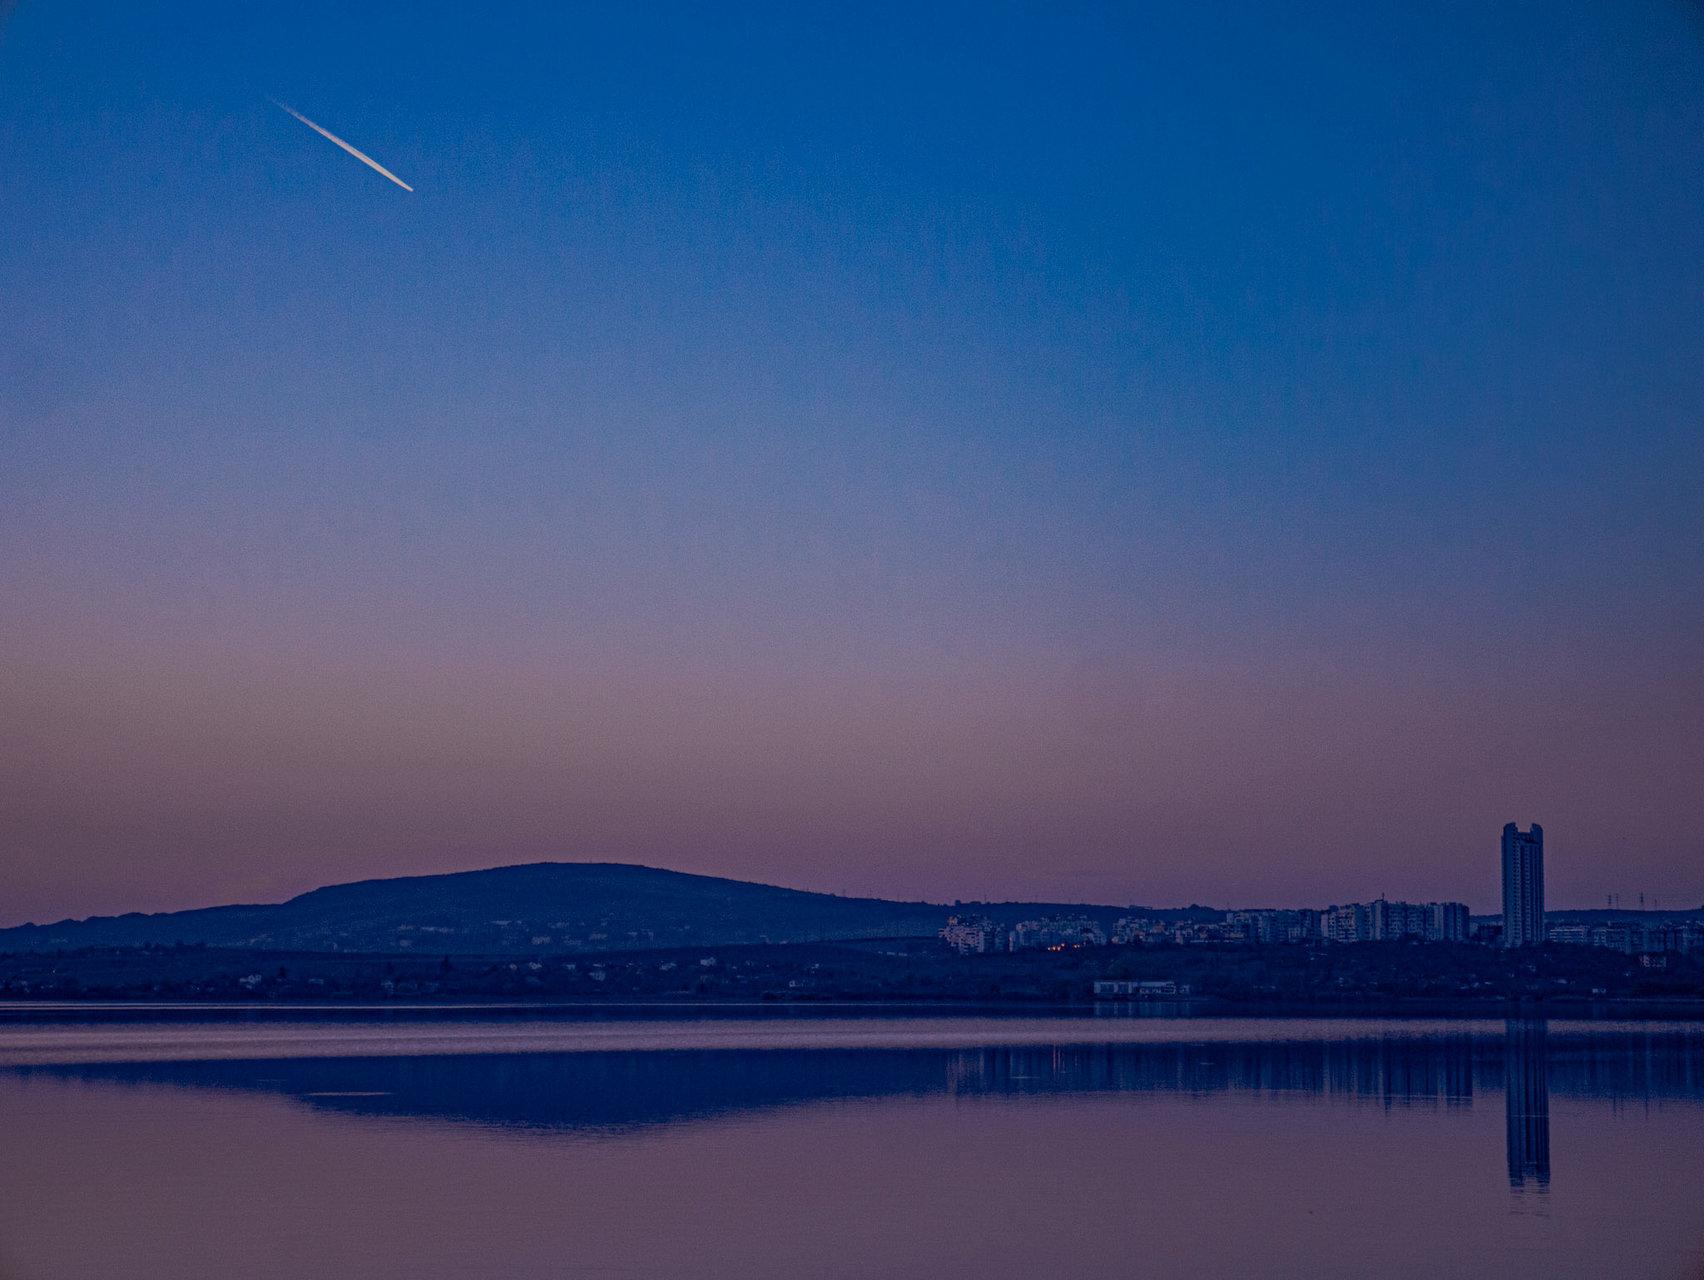 Photo in Landscape | Author Ralitsa Stanisheva - Islay | PHOTO FORUM